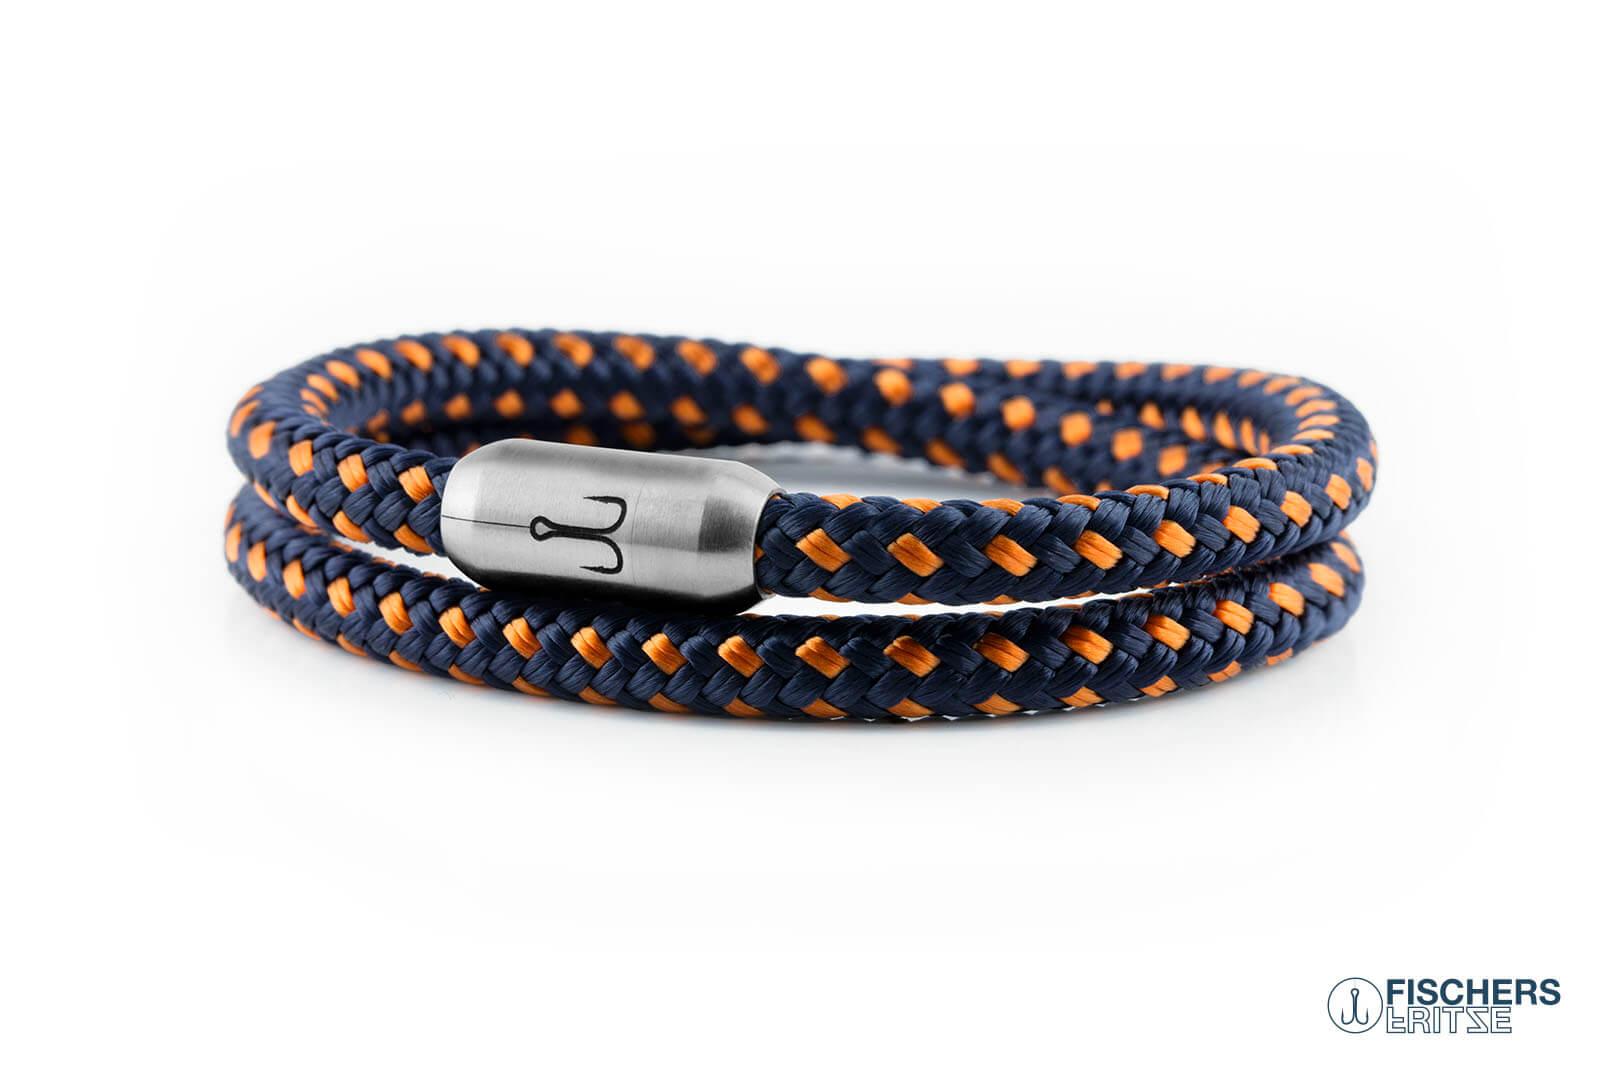 armband-fischers-fritze-garnele-blau-orange-segeltau